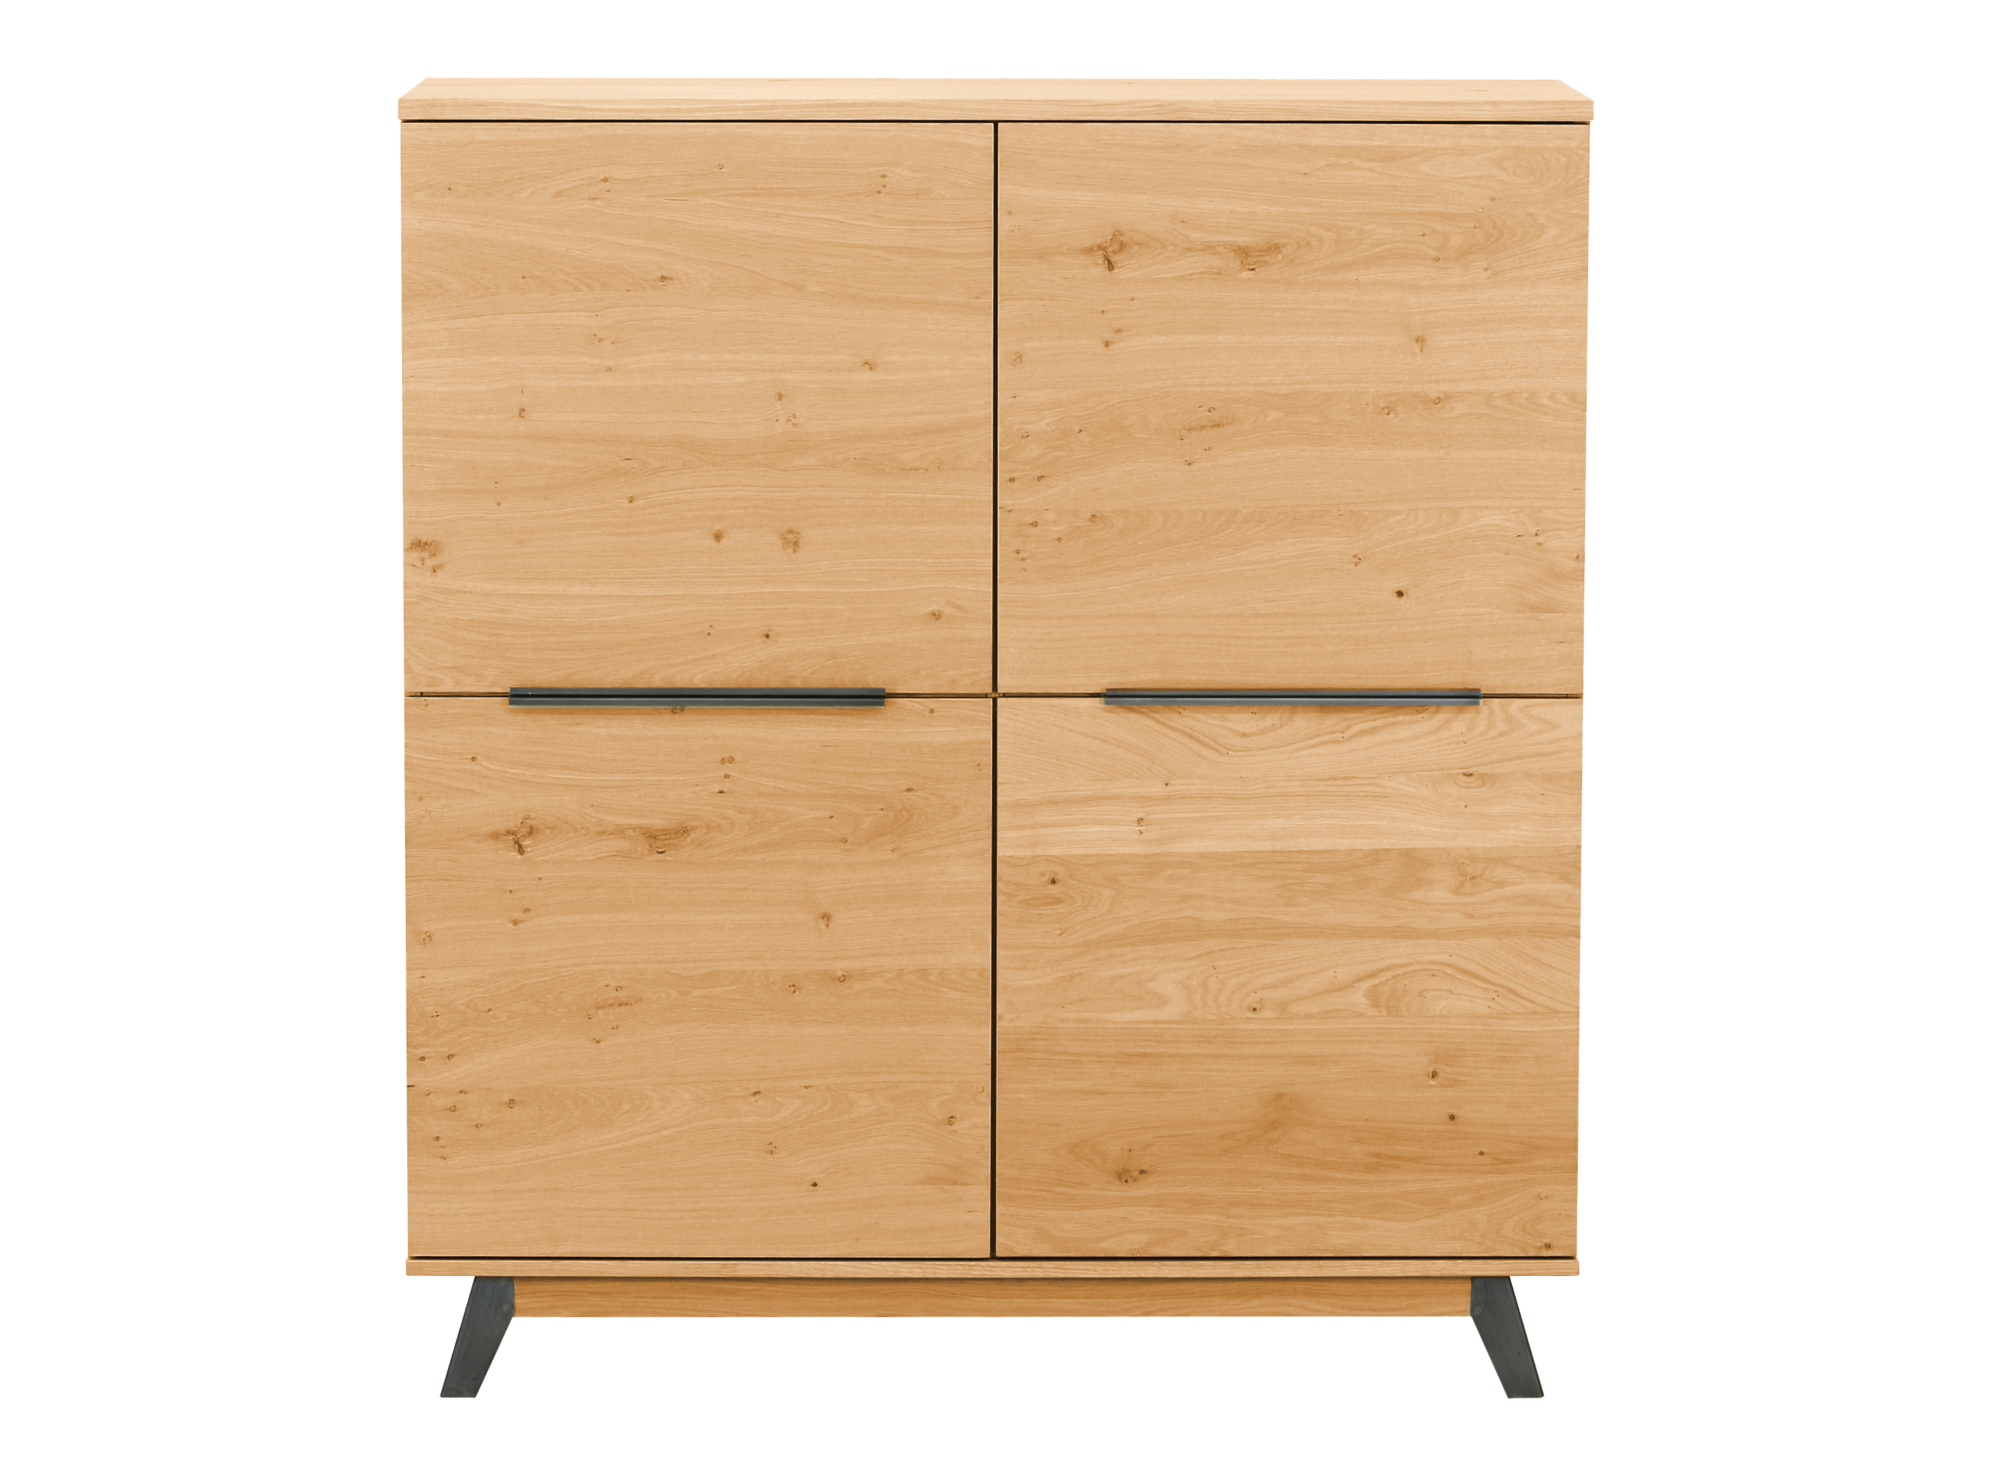 rangement 4 portes plaque chene fly achats maison achat maison rangement et meuble rangement. Black Bedroom Furniture Sets. Home Design Ideas